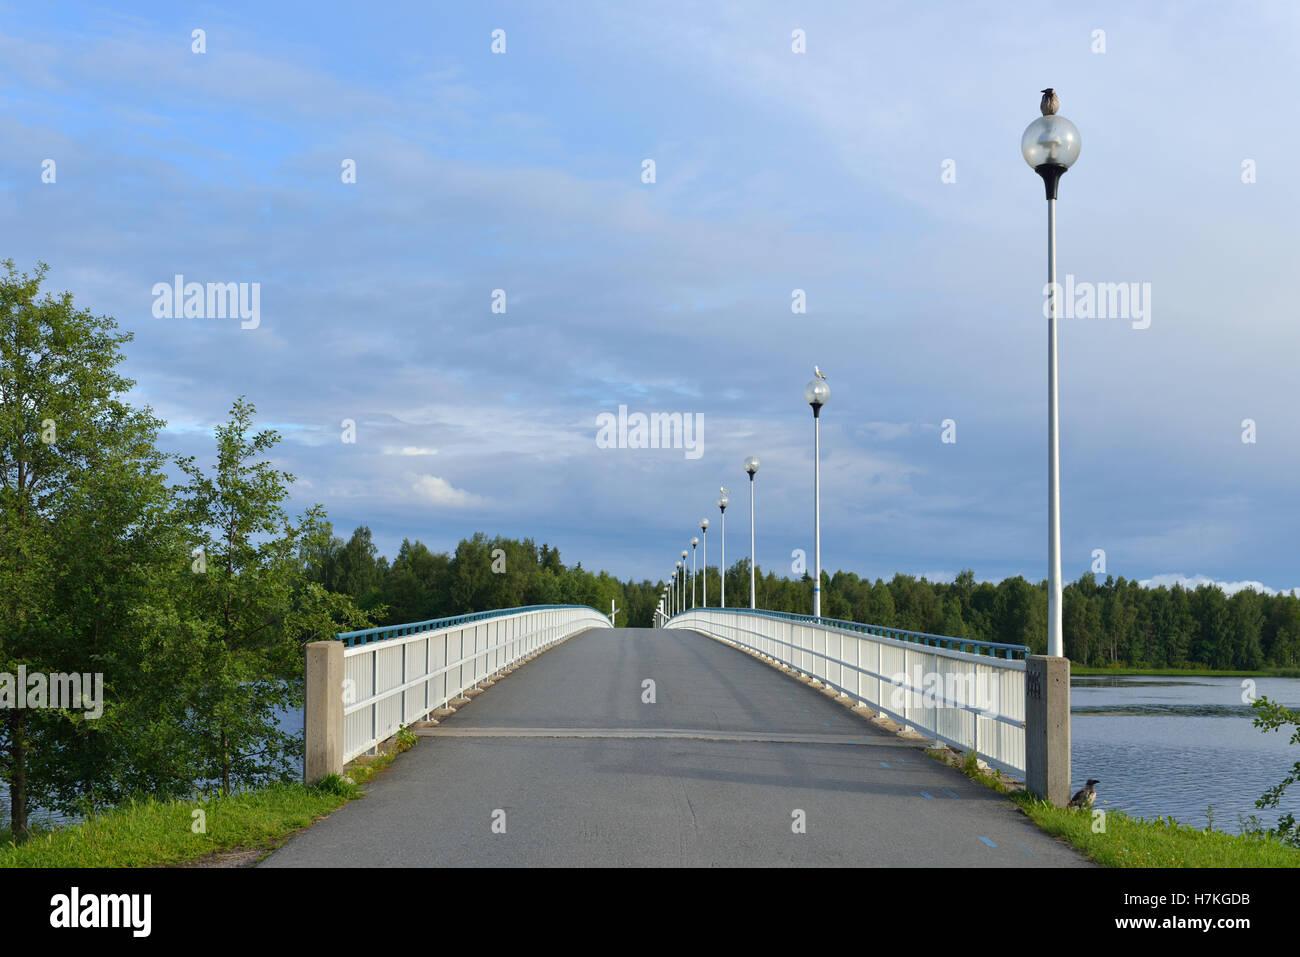 Bridge across river Oulujoki in Oulu, Finland - Stock Image